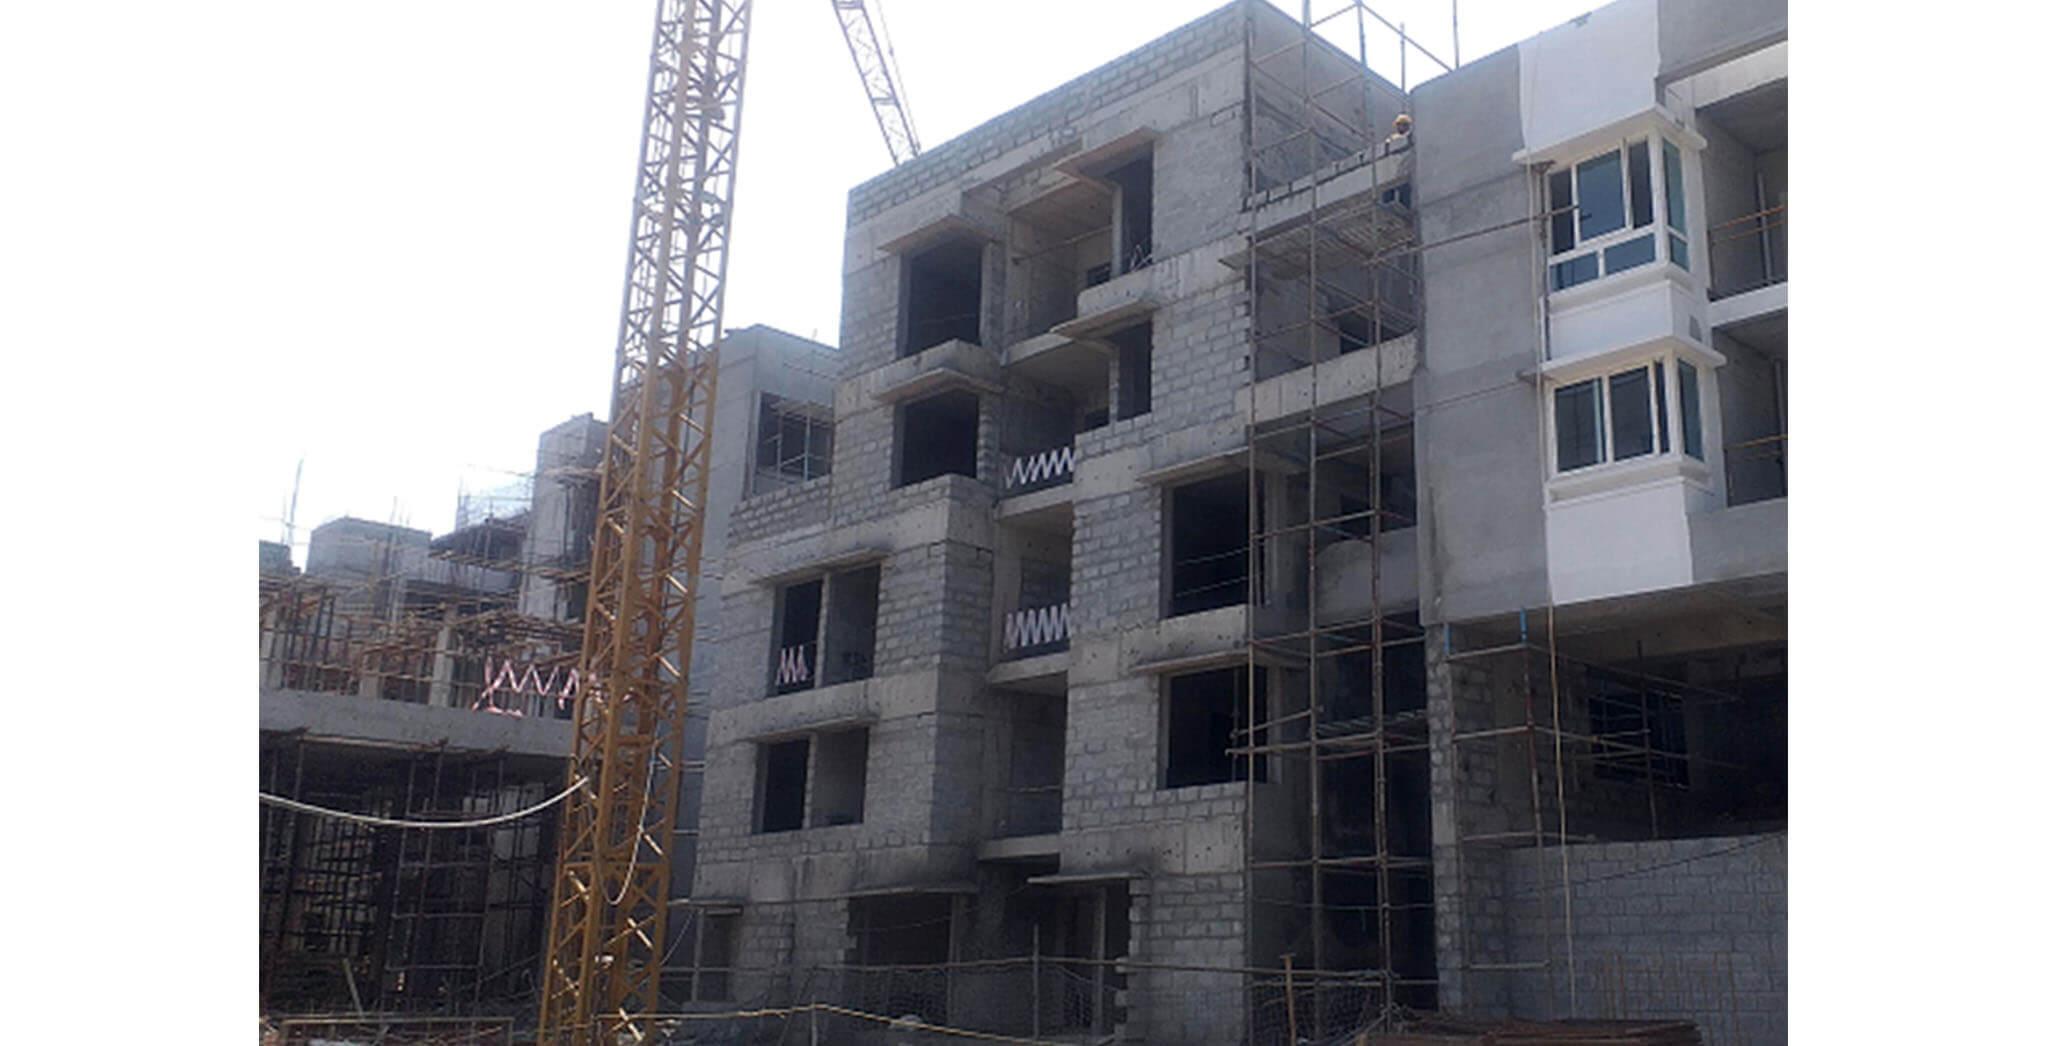 Feb 2021 - Podium side view: J Block—Internal plastering work-in-progress